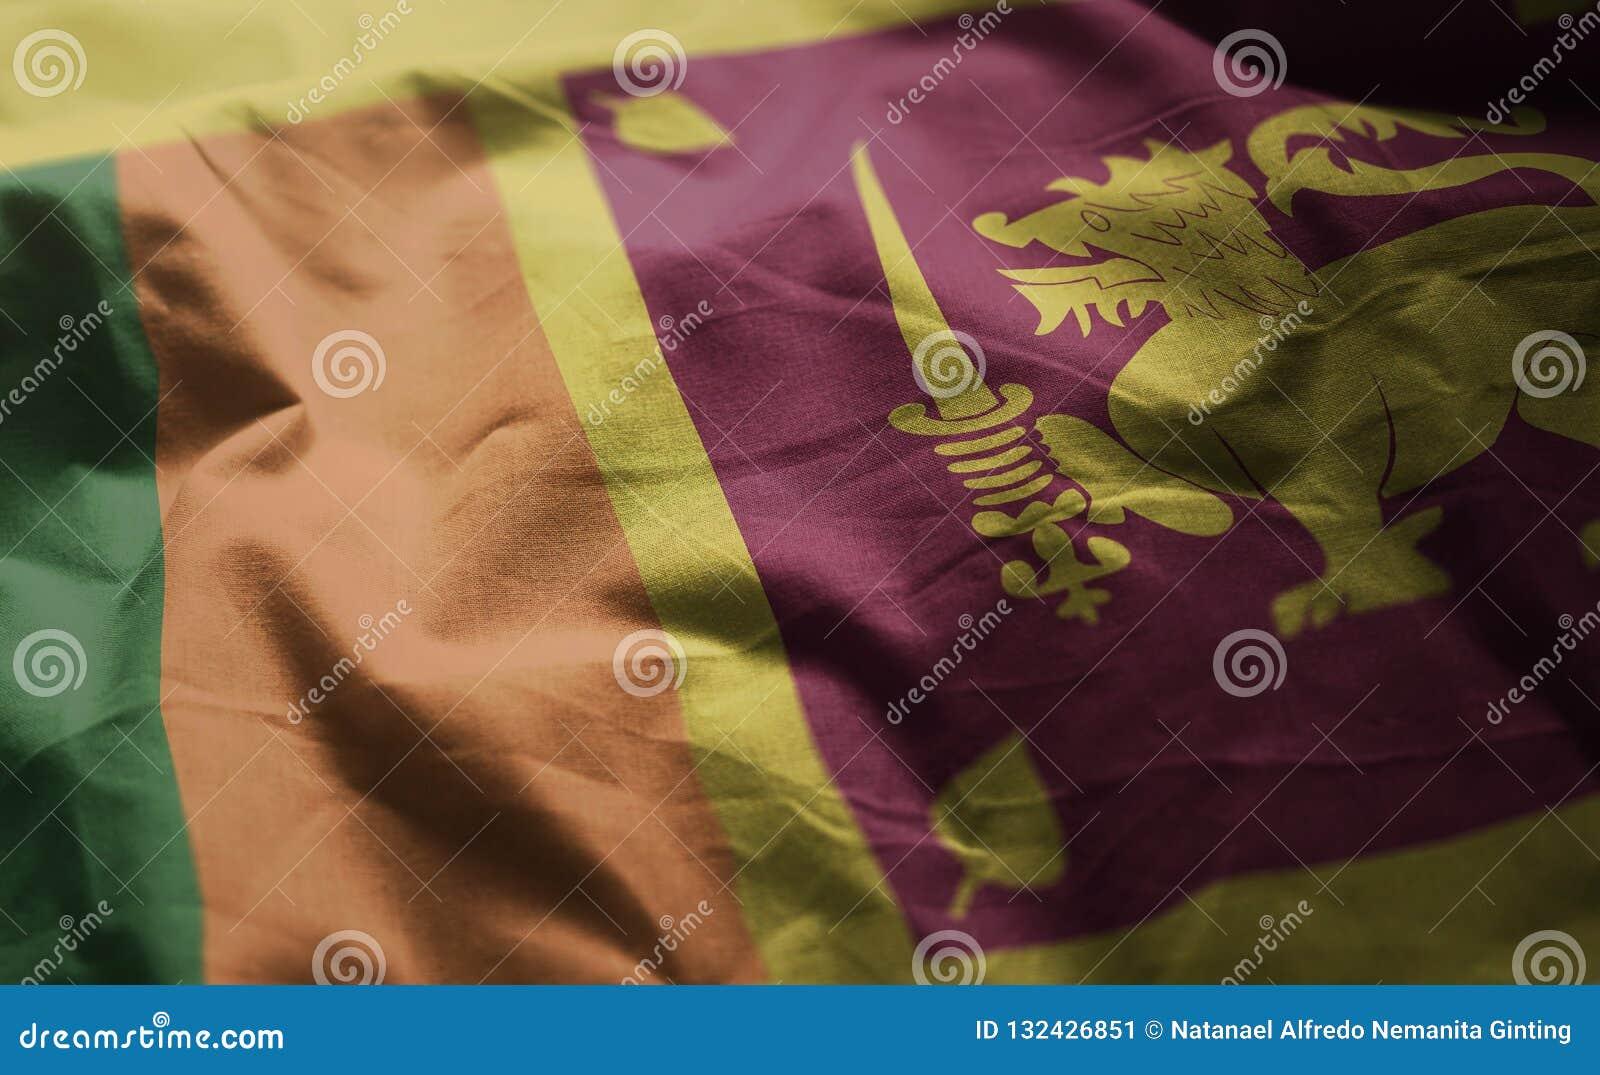 0616d93dde8 Sri Lanka Flag Rumpled Close Up Stock Image - Image of authentic ...